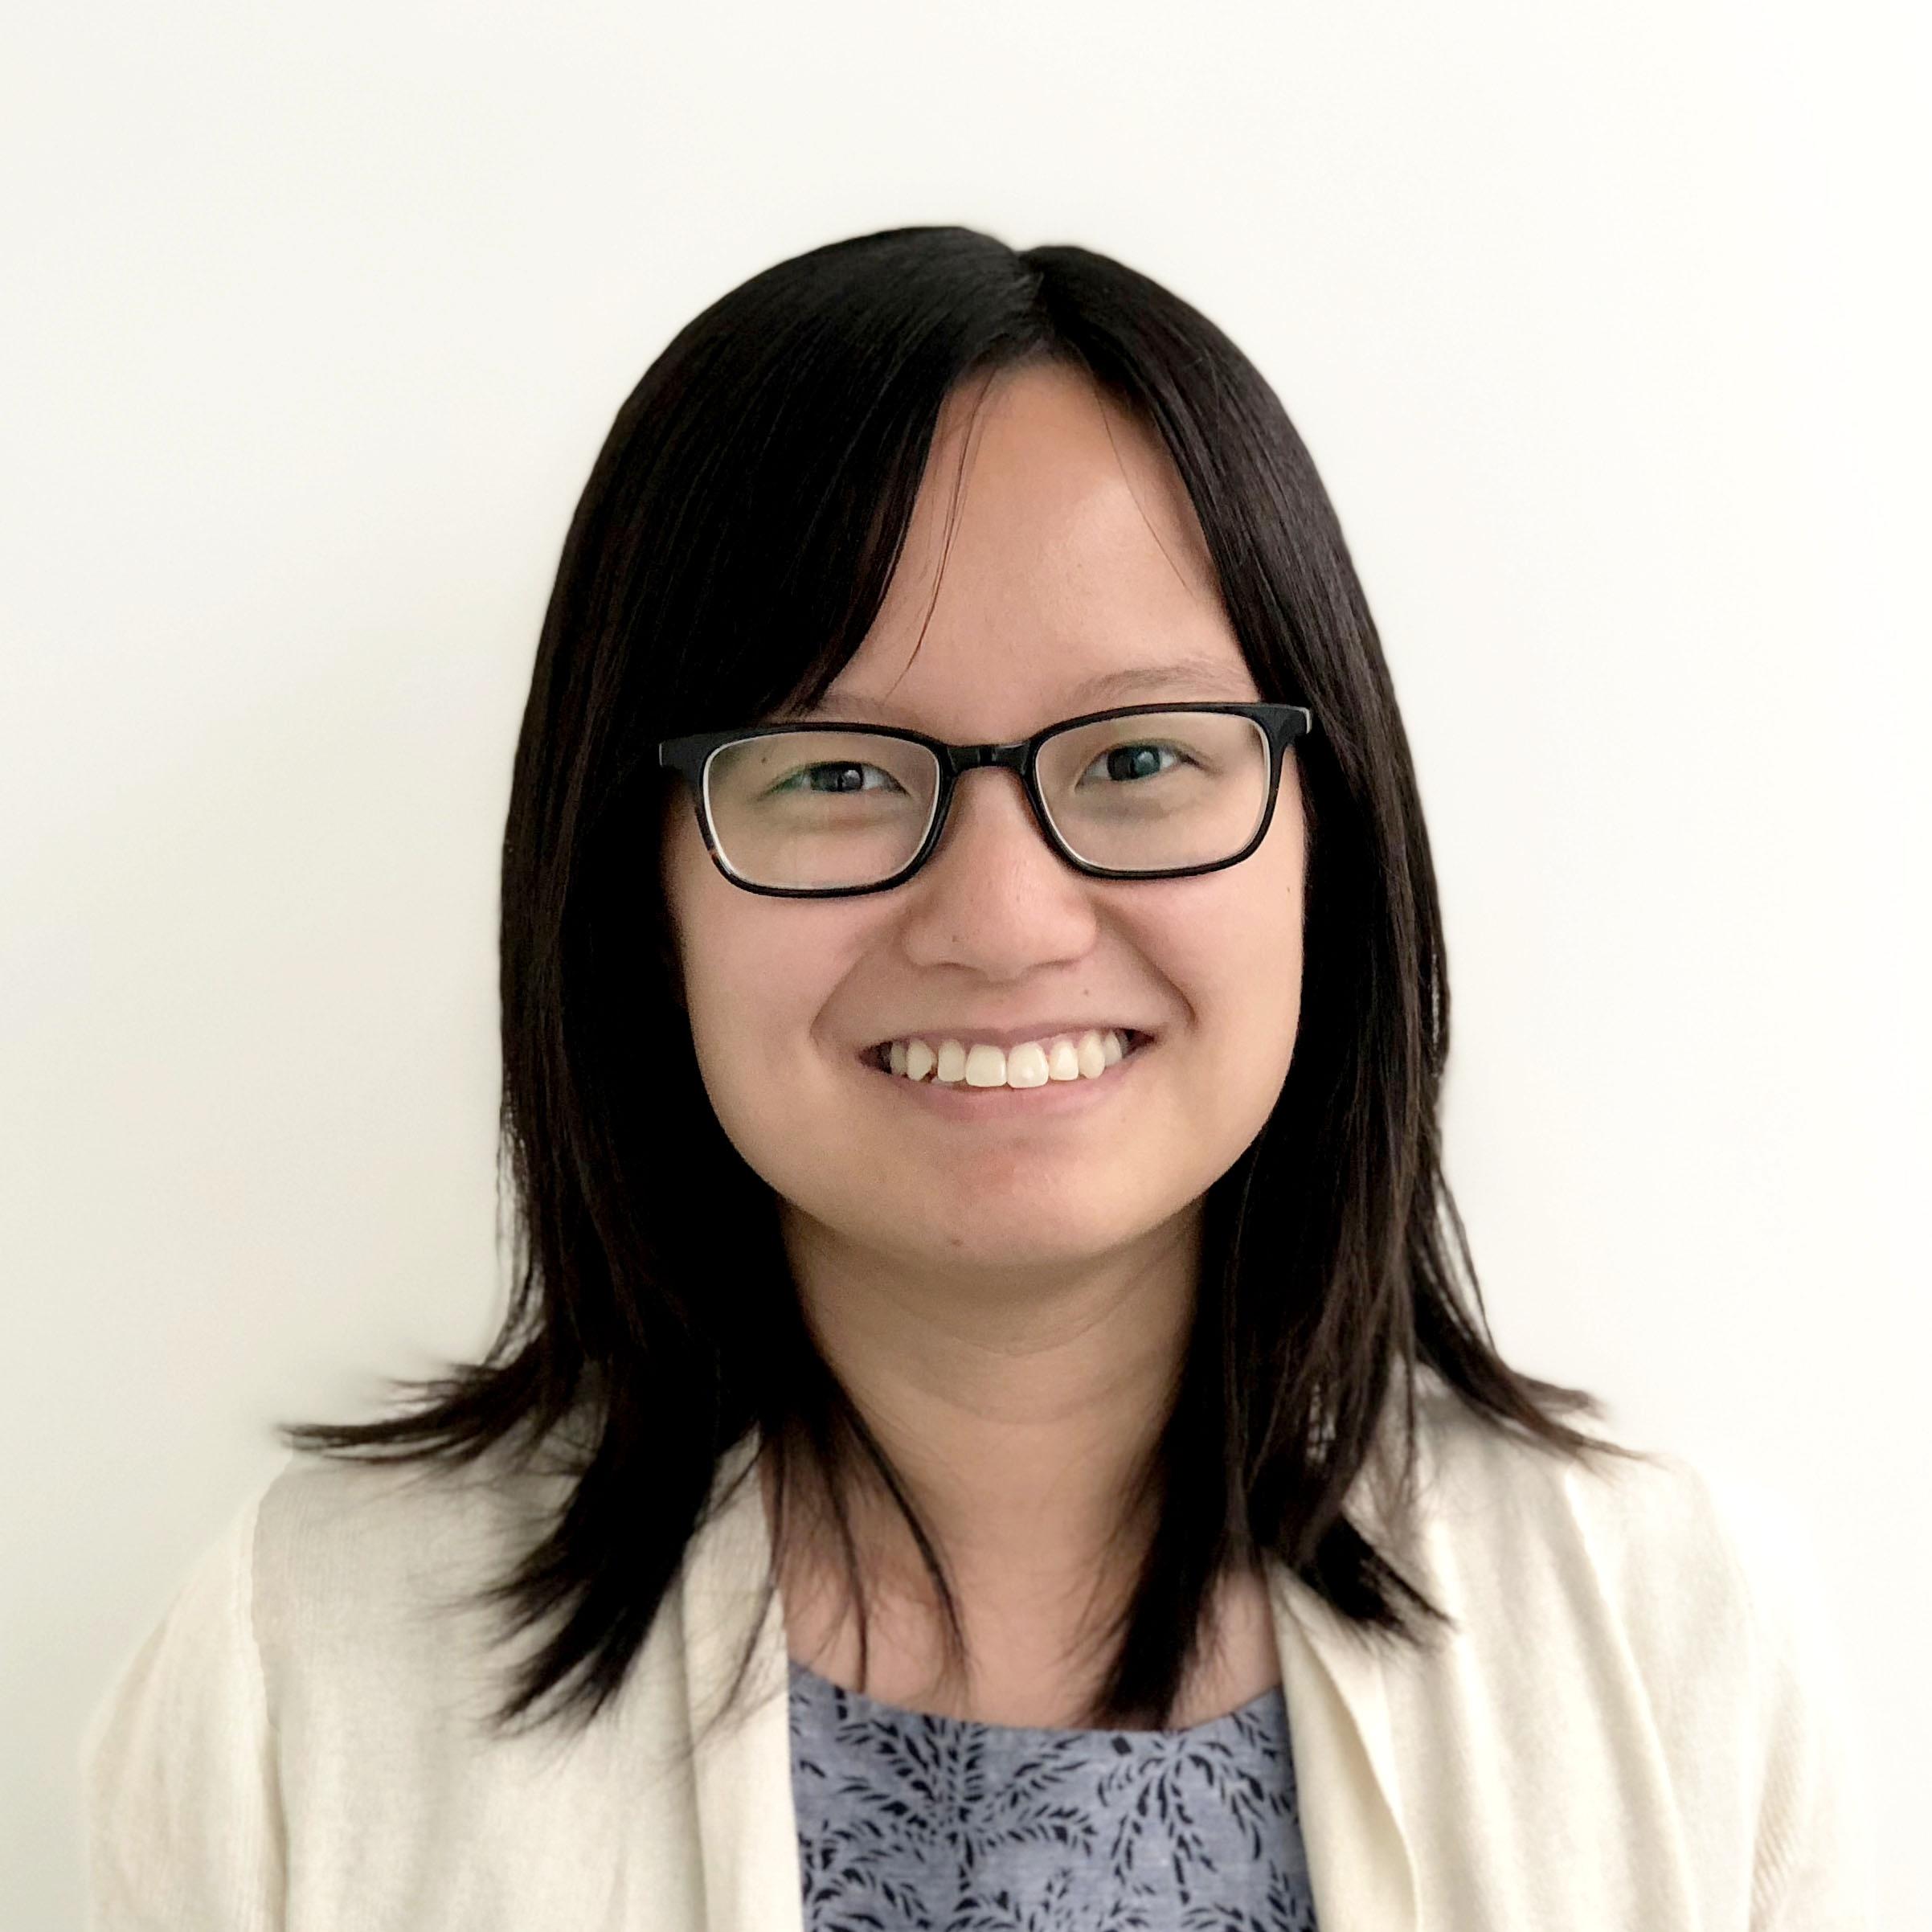 Allison King, Software Engineer